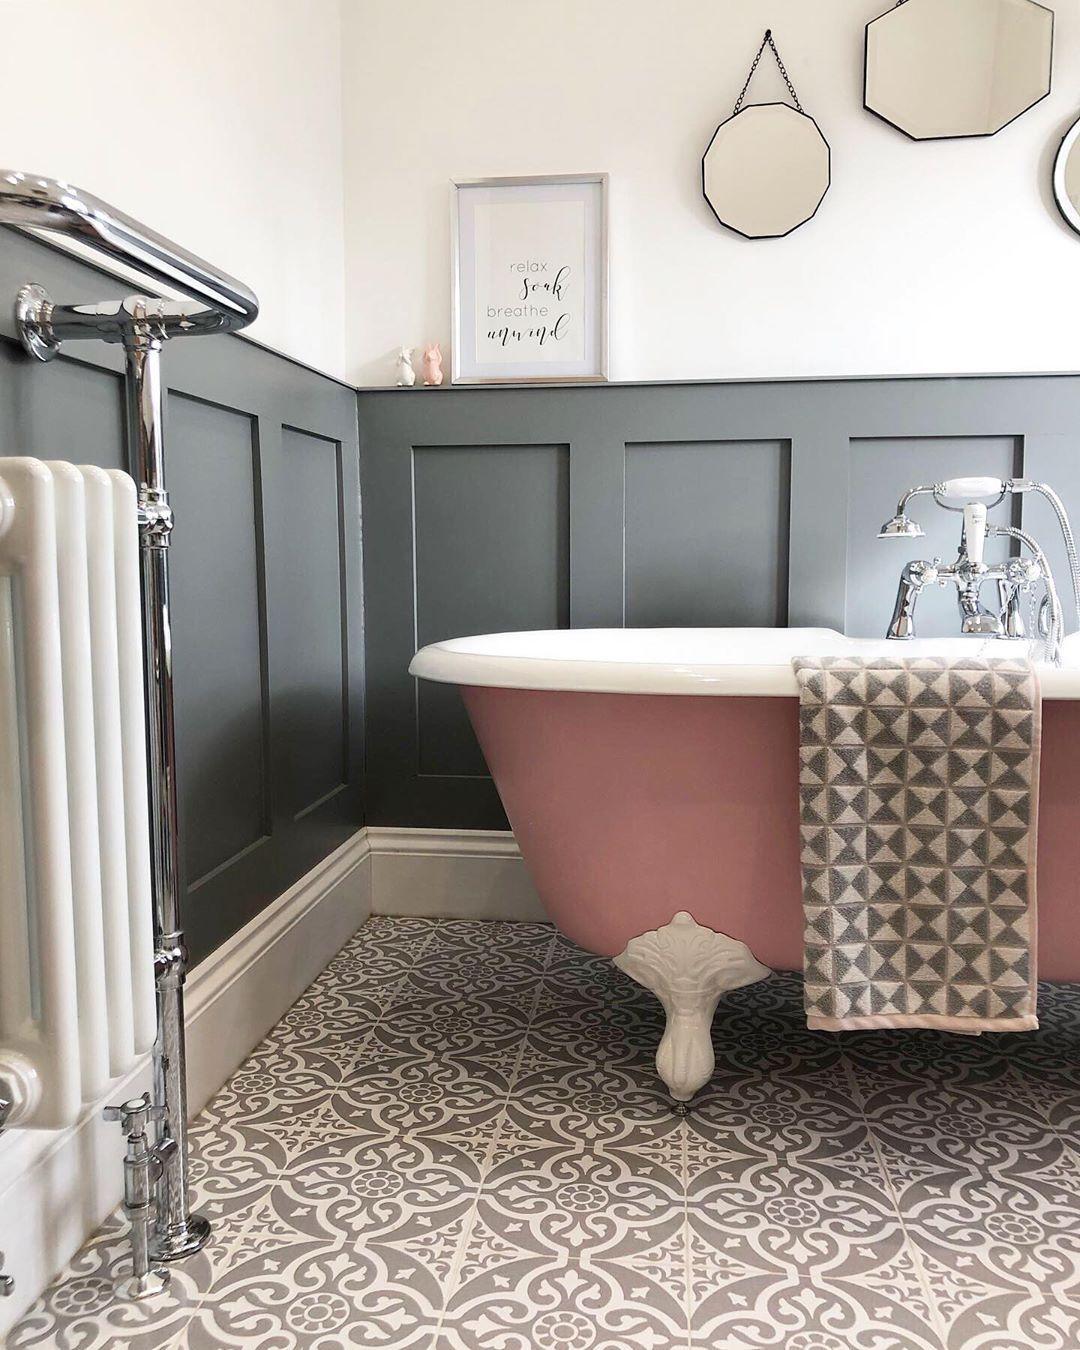 Milton Villa On Instagram Wow I Still Can T Quite Believe That Shopmatalan Liked This Image Of My Bath Bathroom Design Geometric Towel Bathroom Inspiration